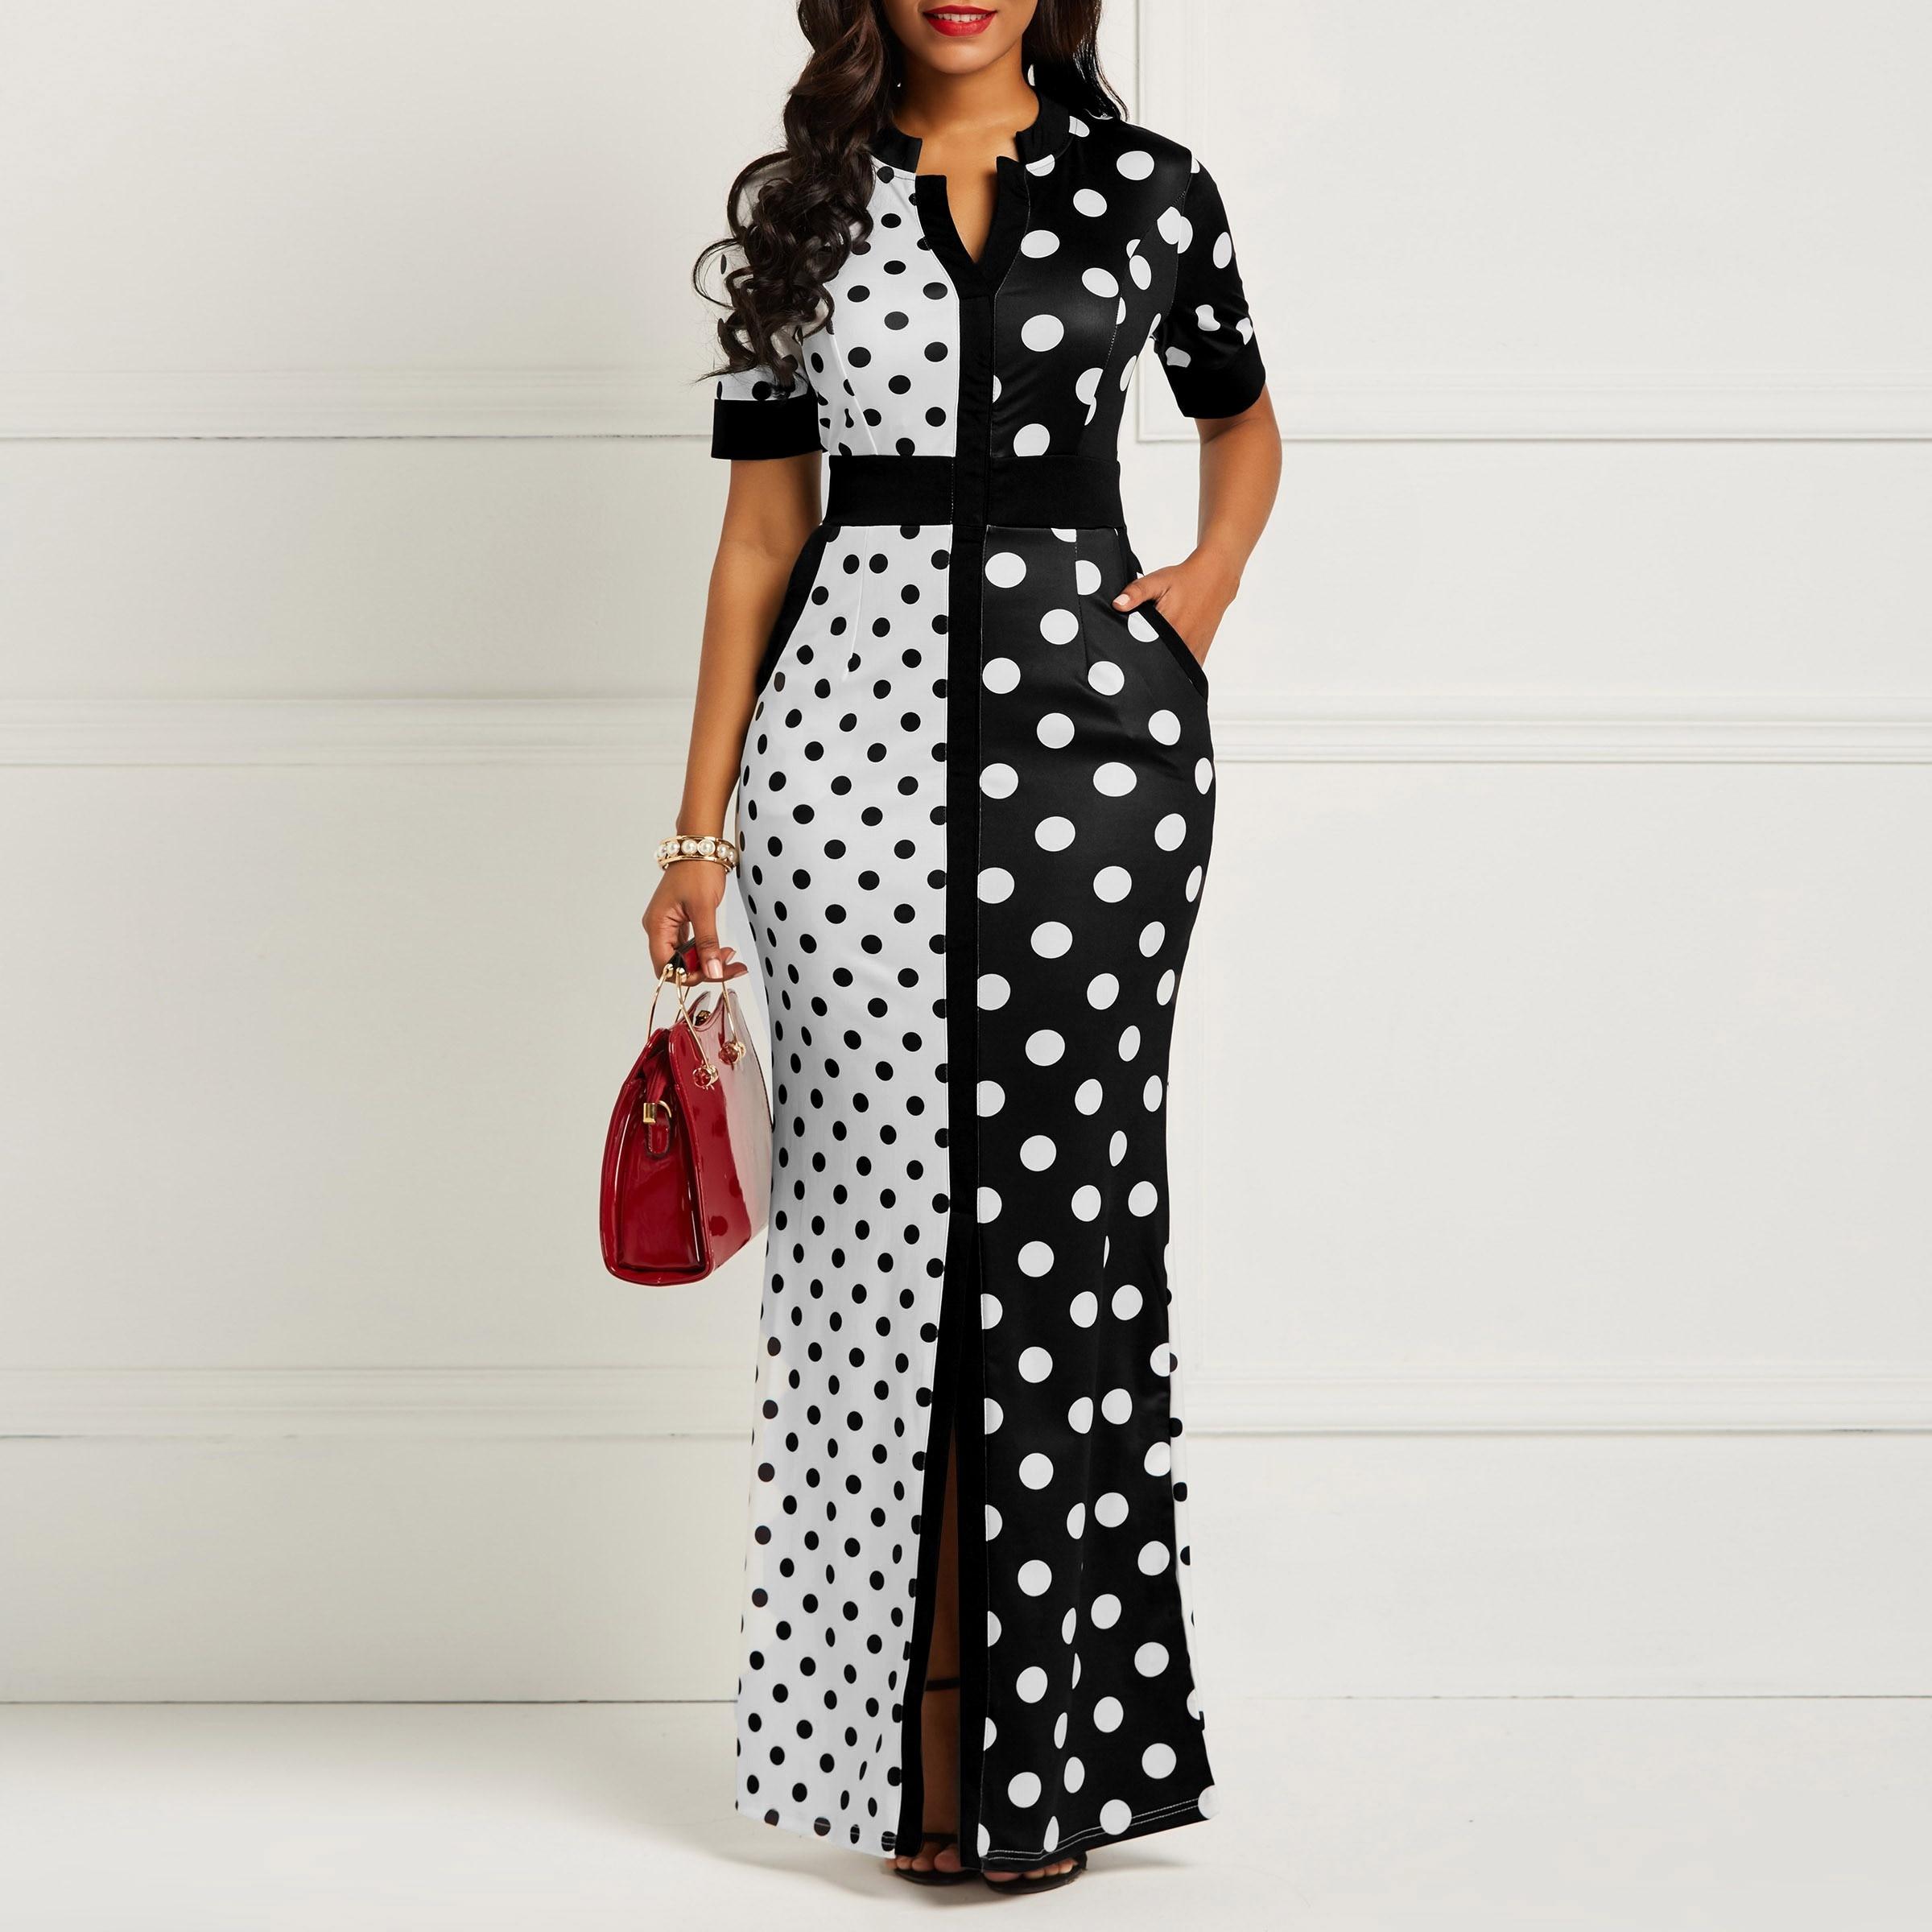 Bodycon Polka Dots Color Block Women Dress Pullover Short Sleeve Color Block Color Block Pocket Print Print